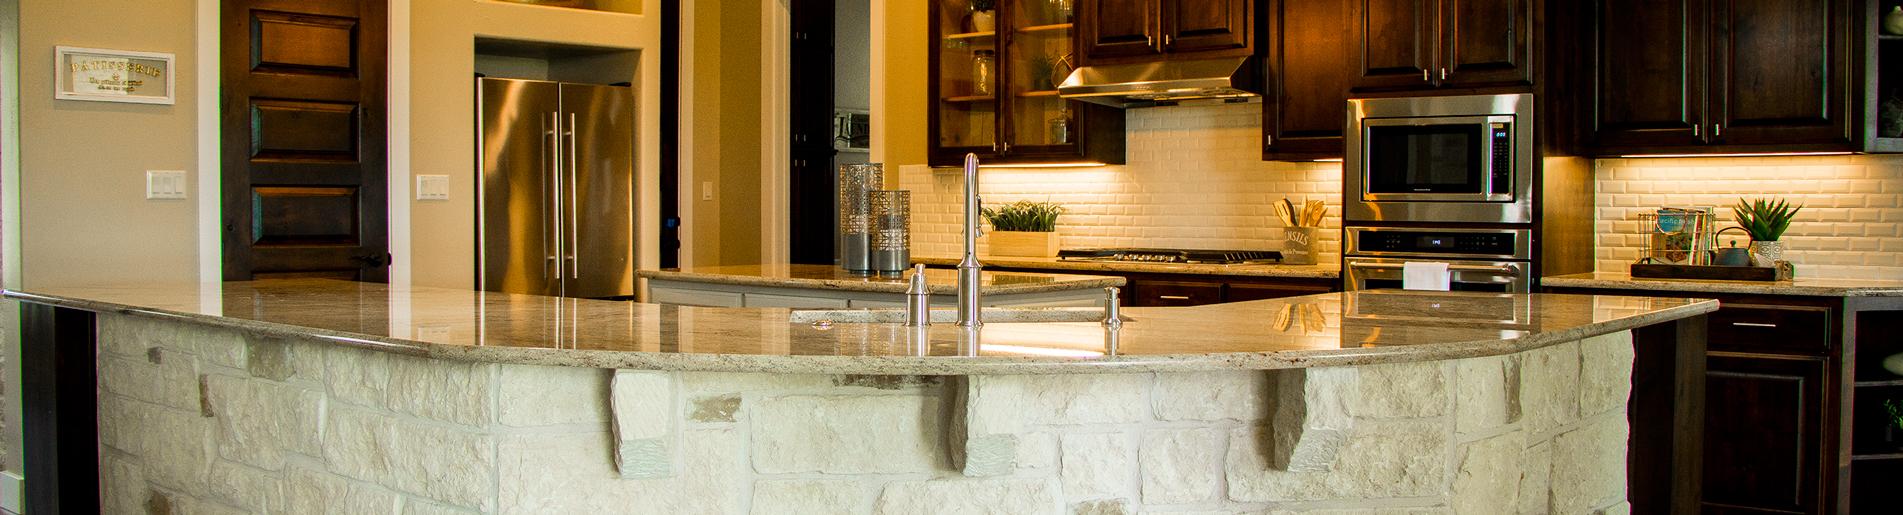 44-sta-granite-bathroom-cambria-c